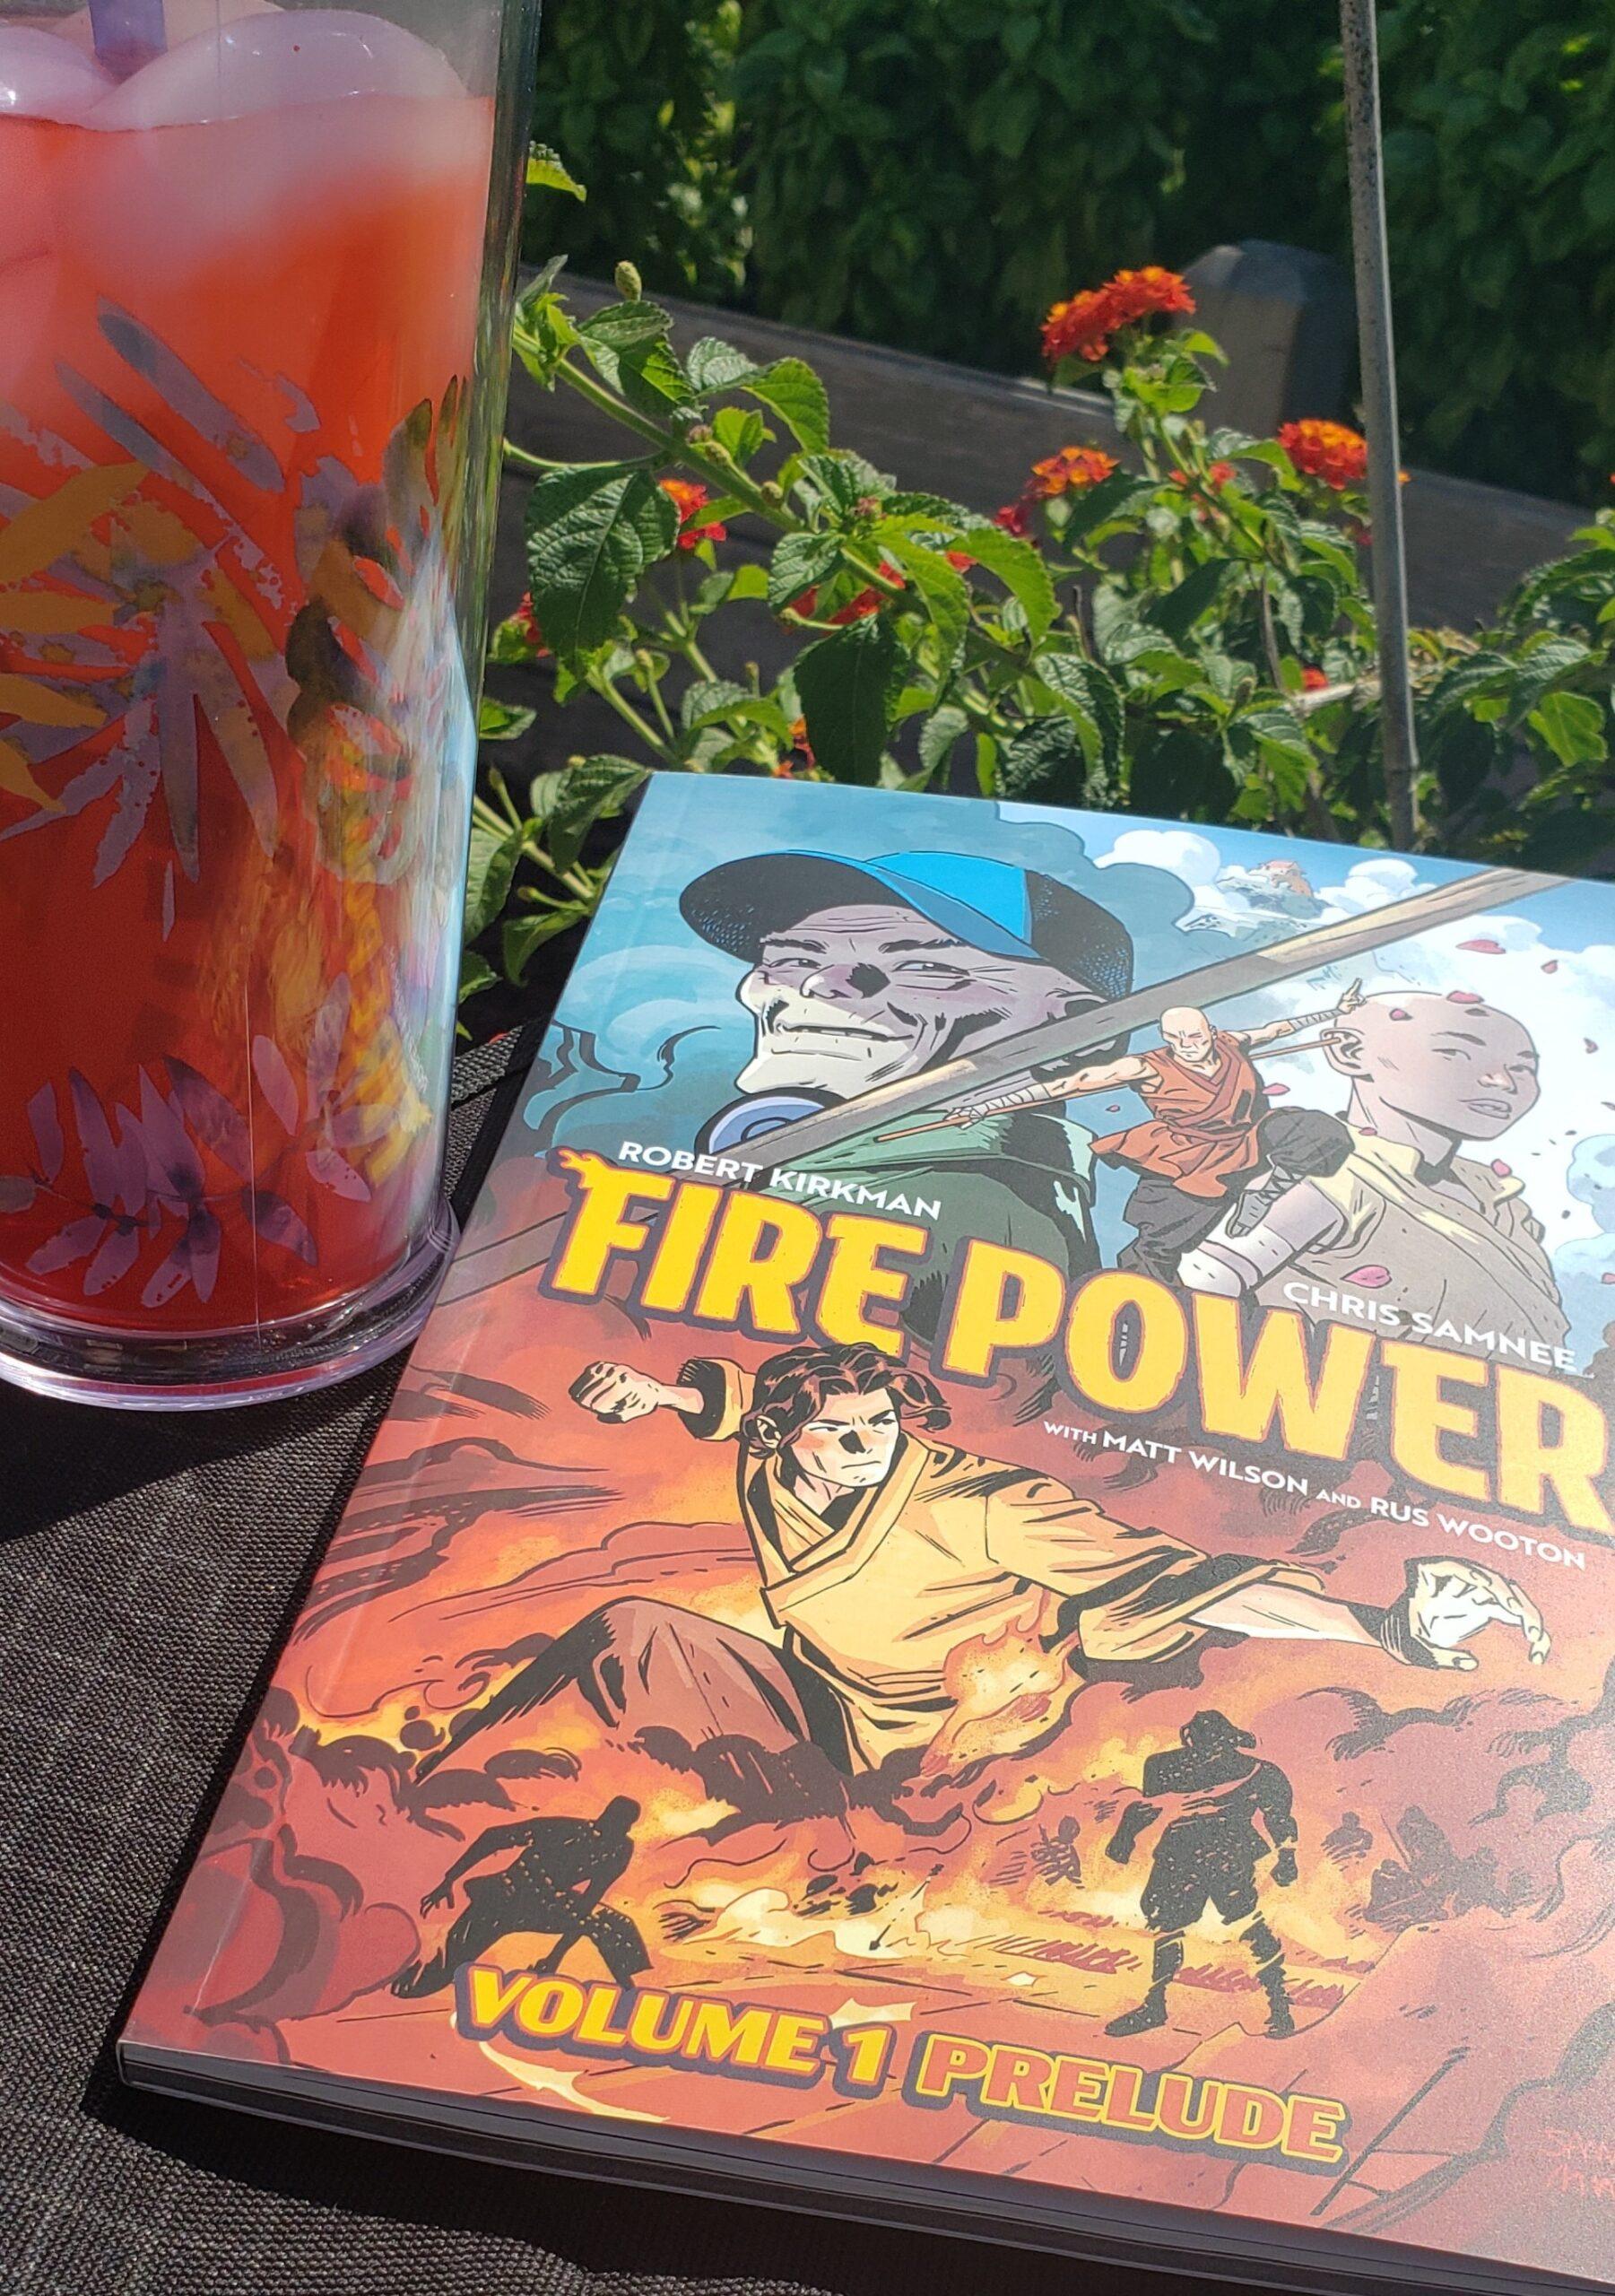 Fire Power Vol 1: Prelude